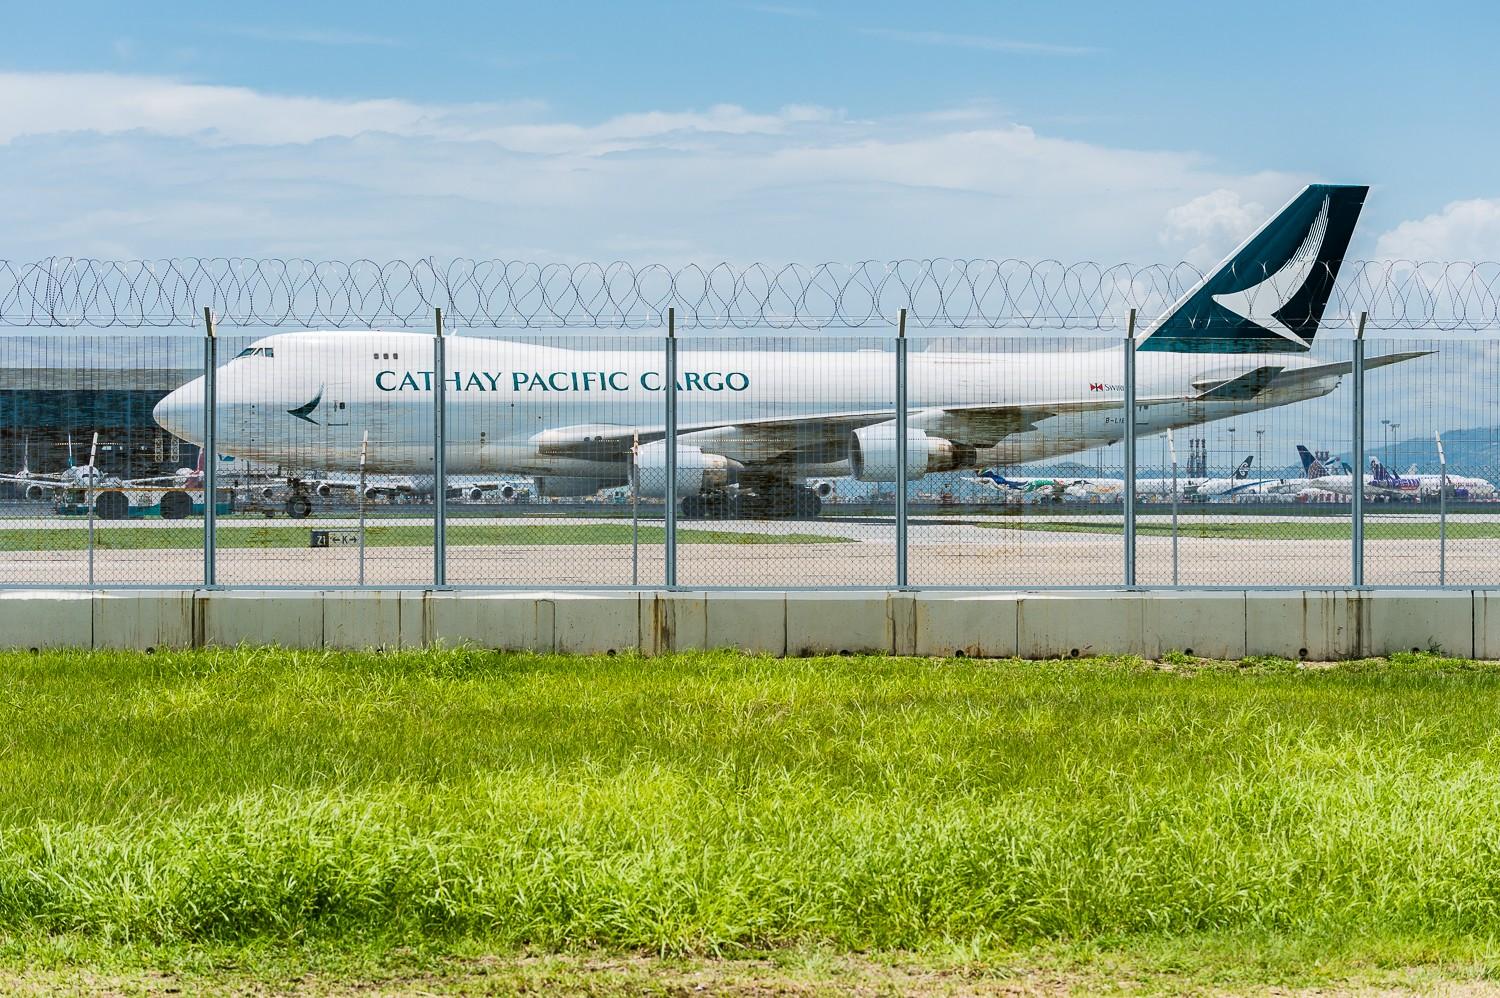 Re:[原创]波音747一组 BOEING 747-400ERF B-LIE 香港赤鱲角国际机场